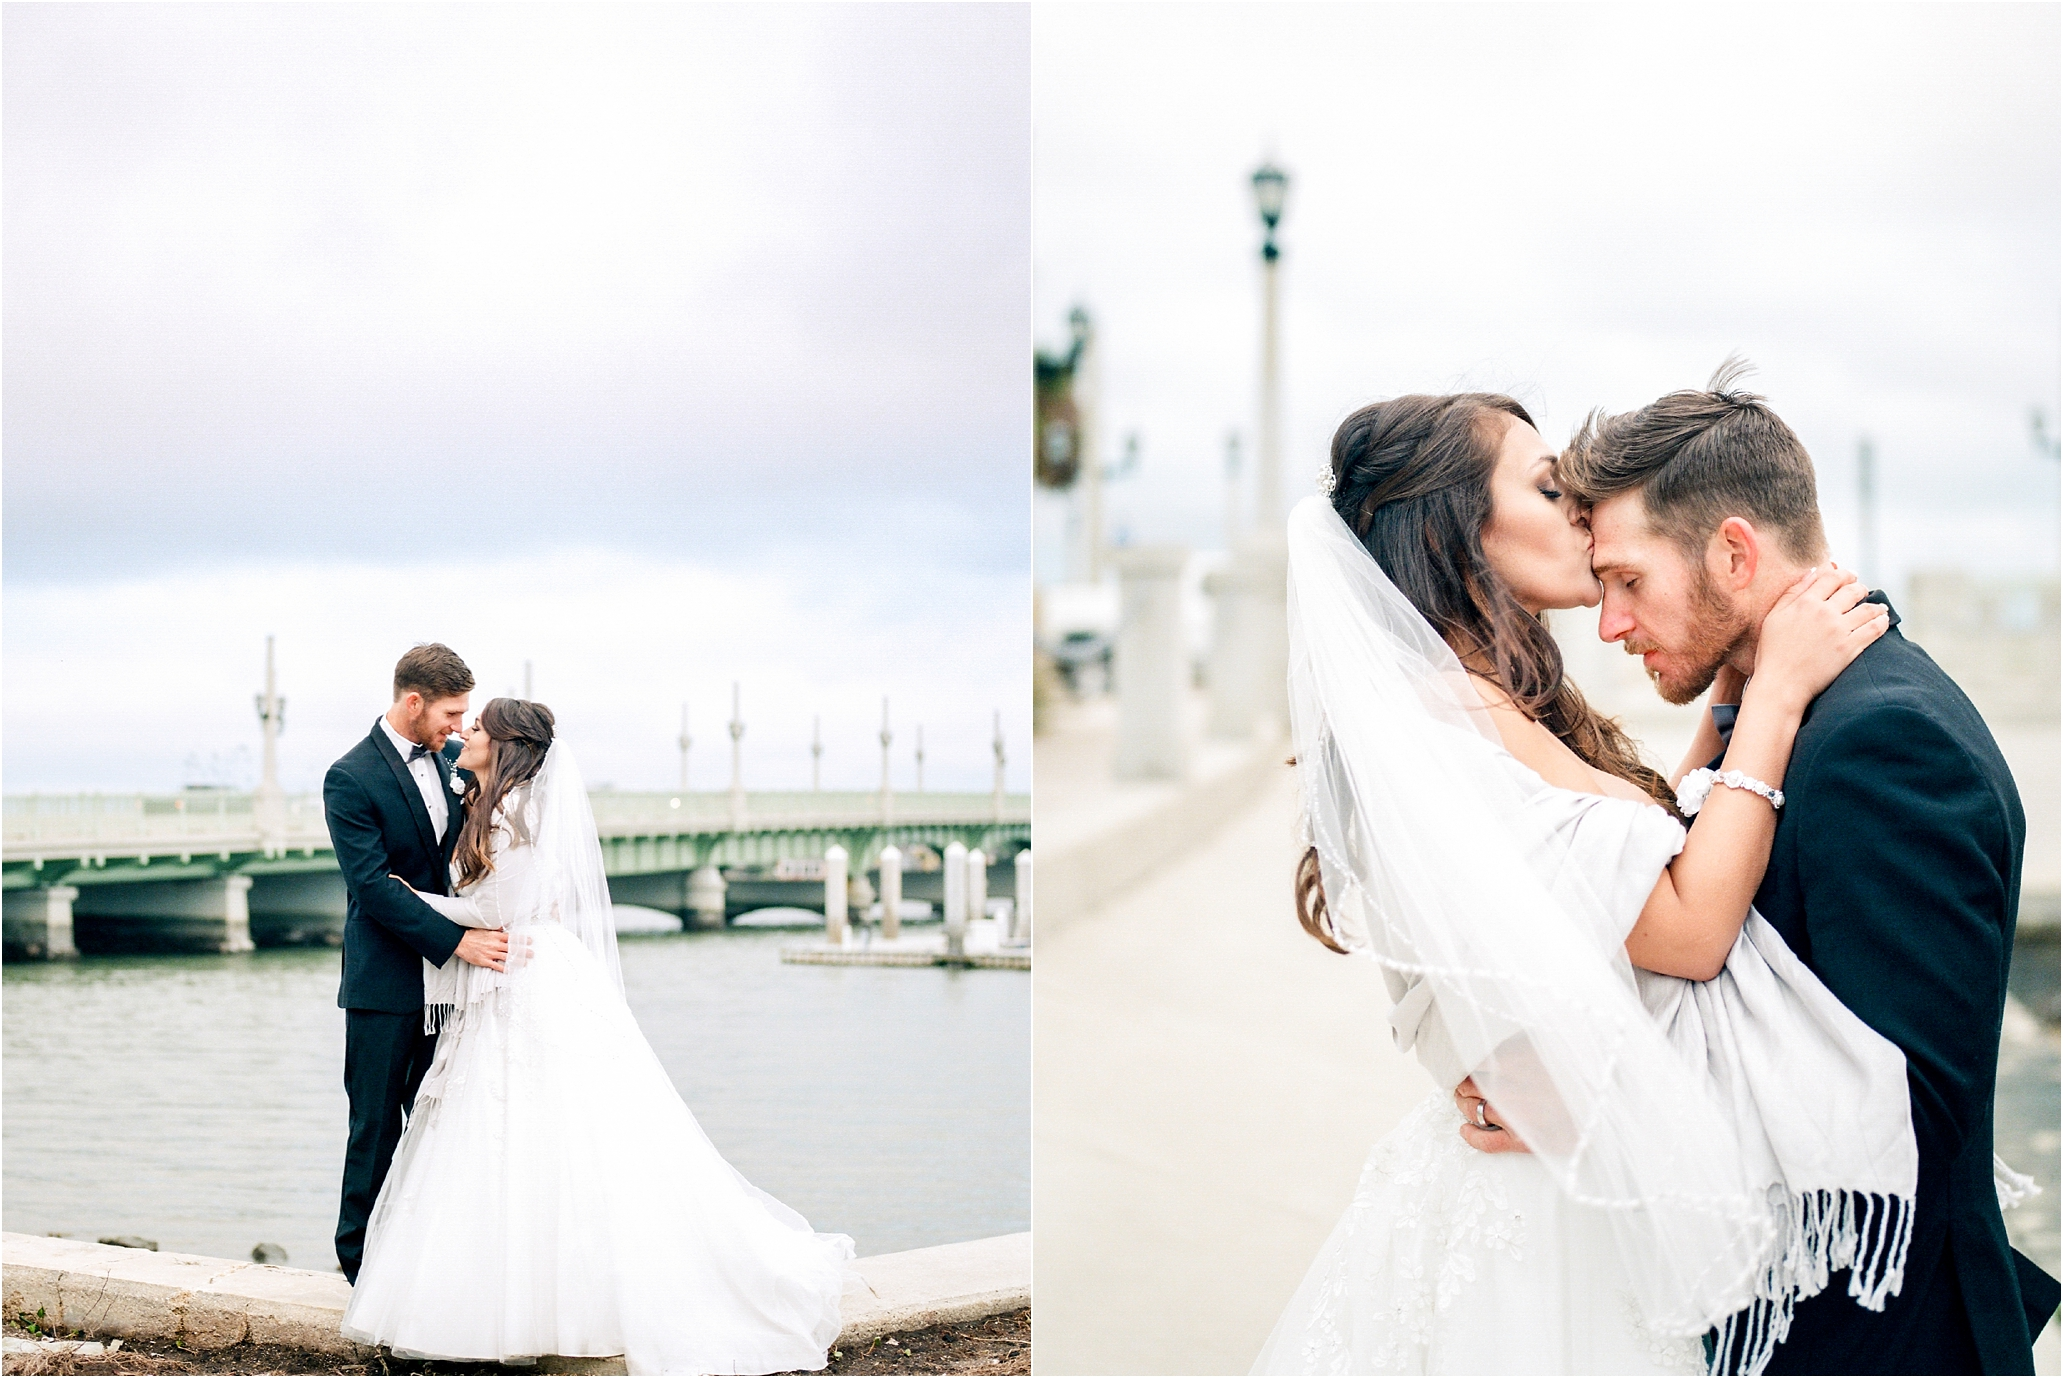 Lisa Silva Photography- Ponte Vedra Beach and Jacksonville, Florida Fine Art Film Wedding Photography- Wedding at The White Room Villa Blanca in St. Augustine, Florida_0059.jpg